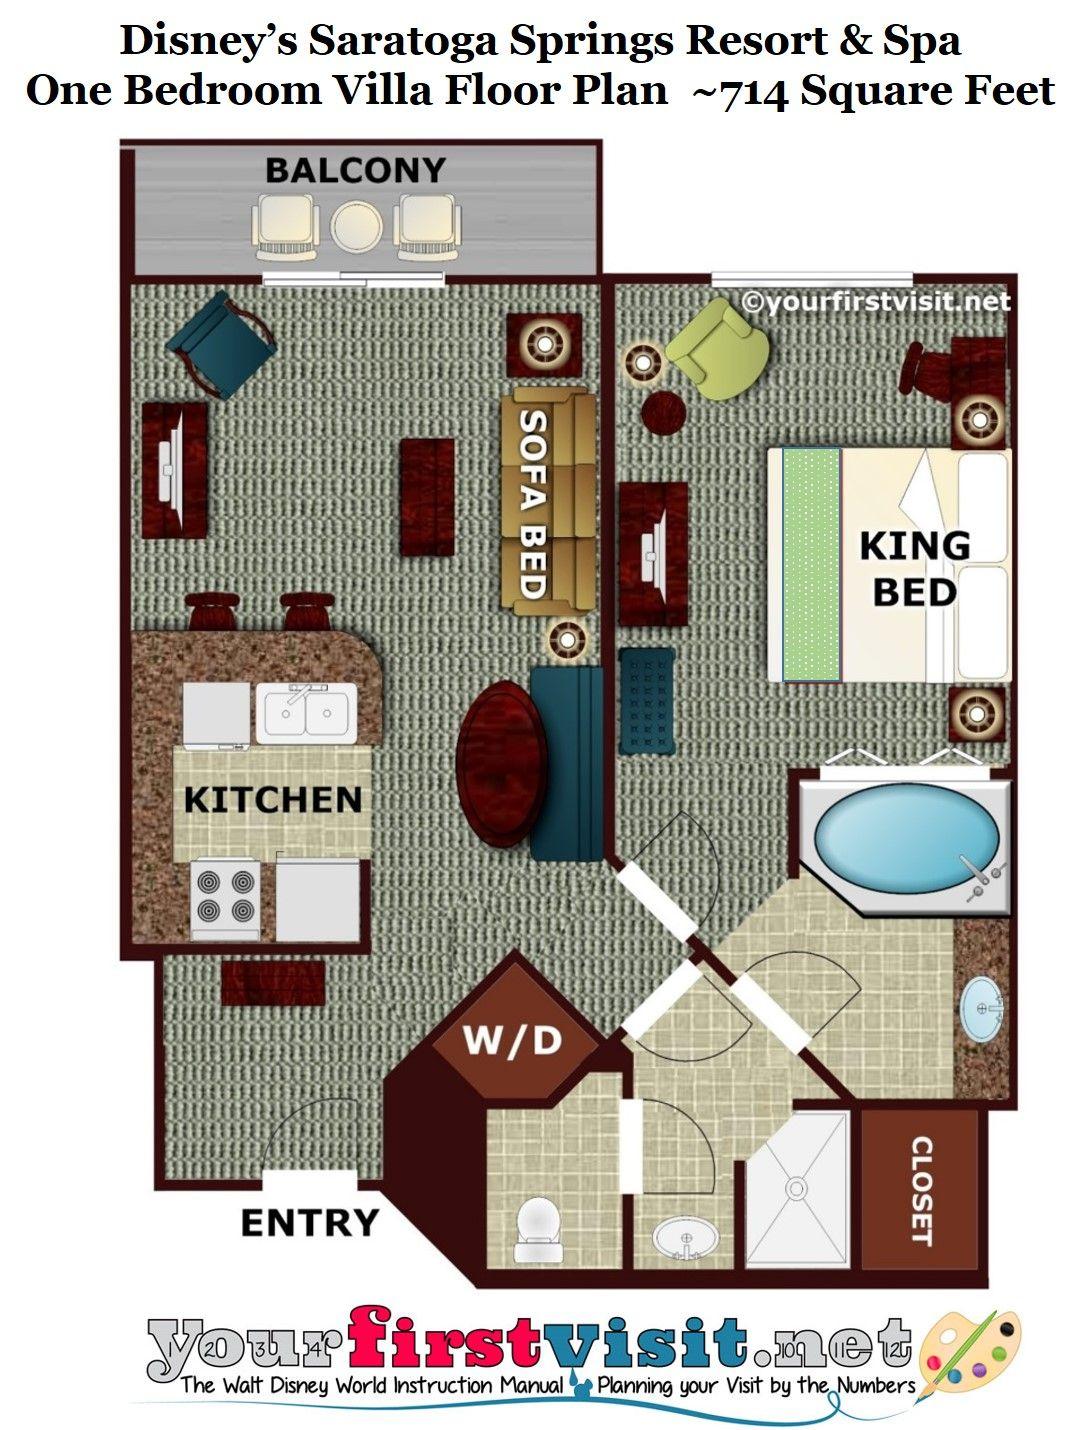 Review Disney's Saratoga Springs Resort & Spa Saratoga